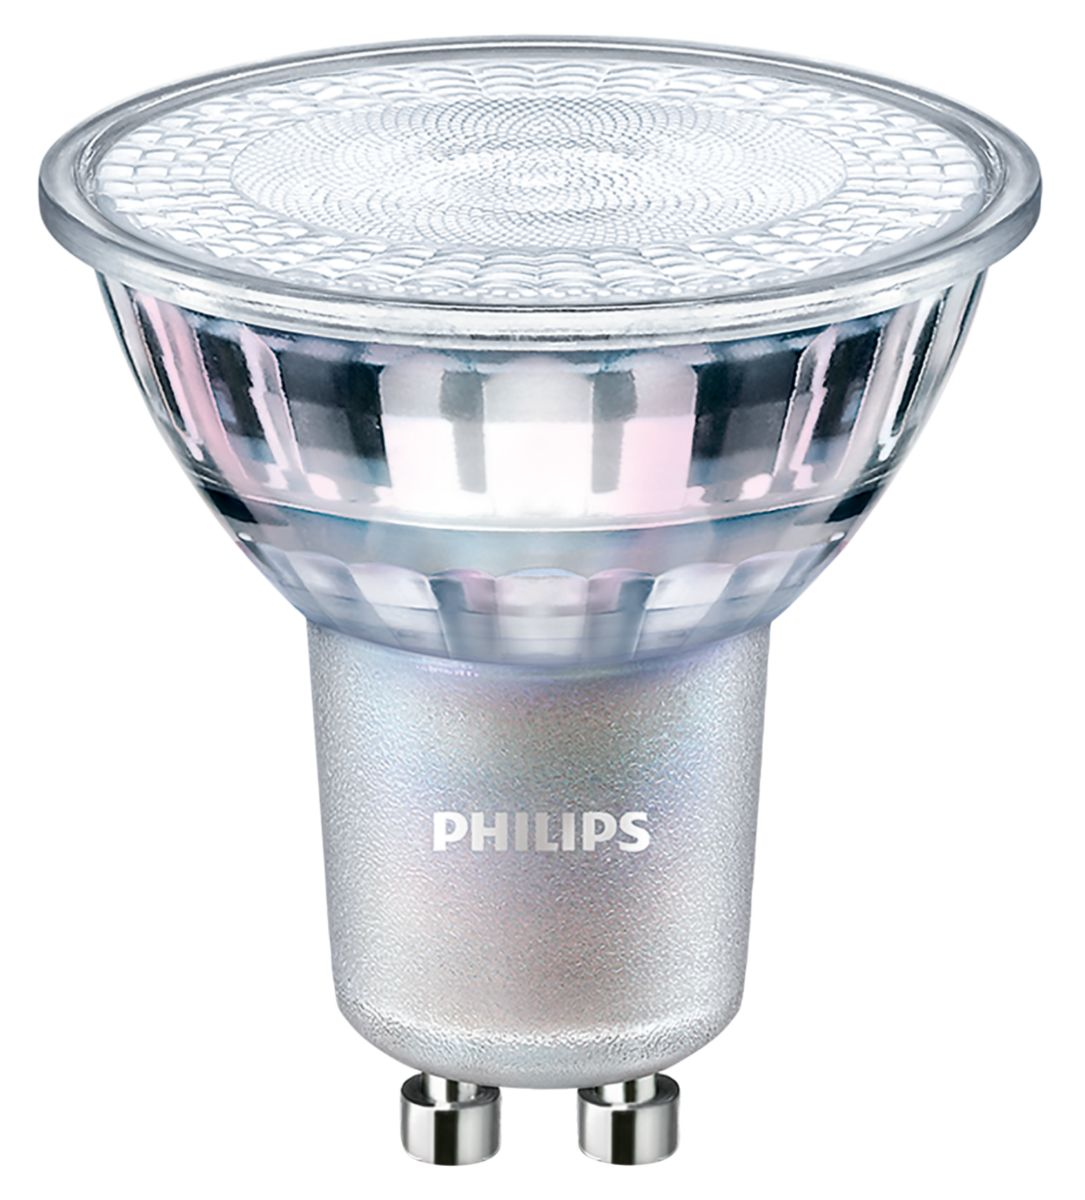 MASTER LED spot VLE D 4.9-50W GU10 927 36D